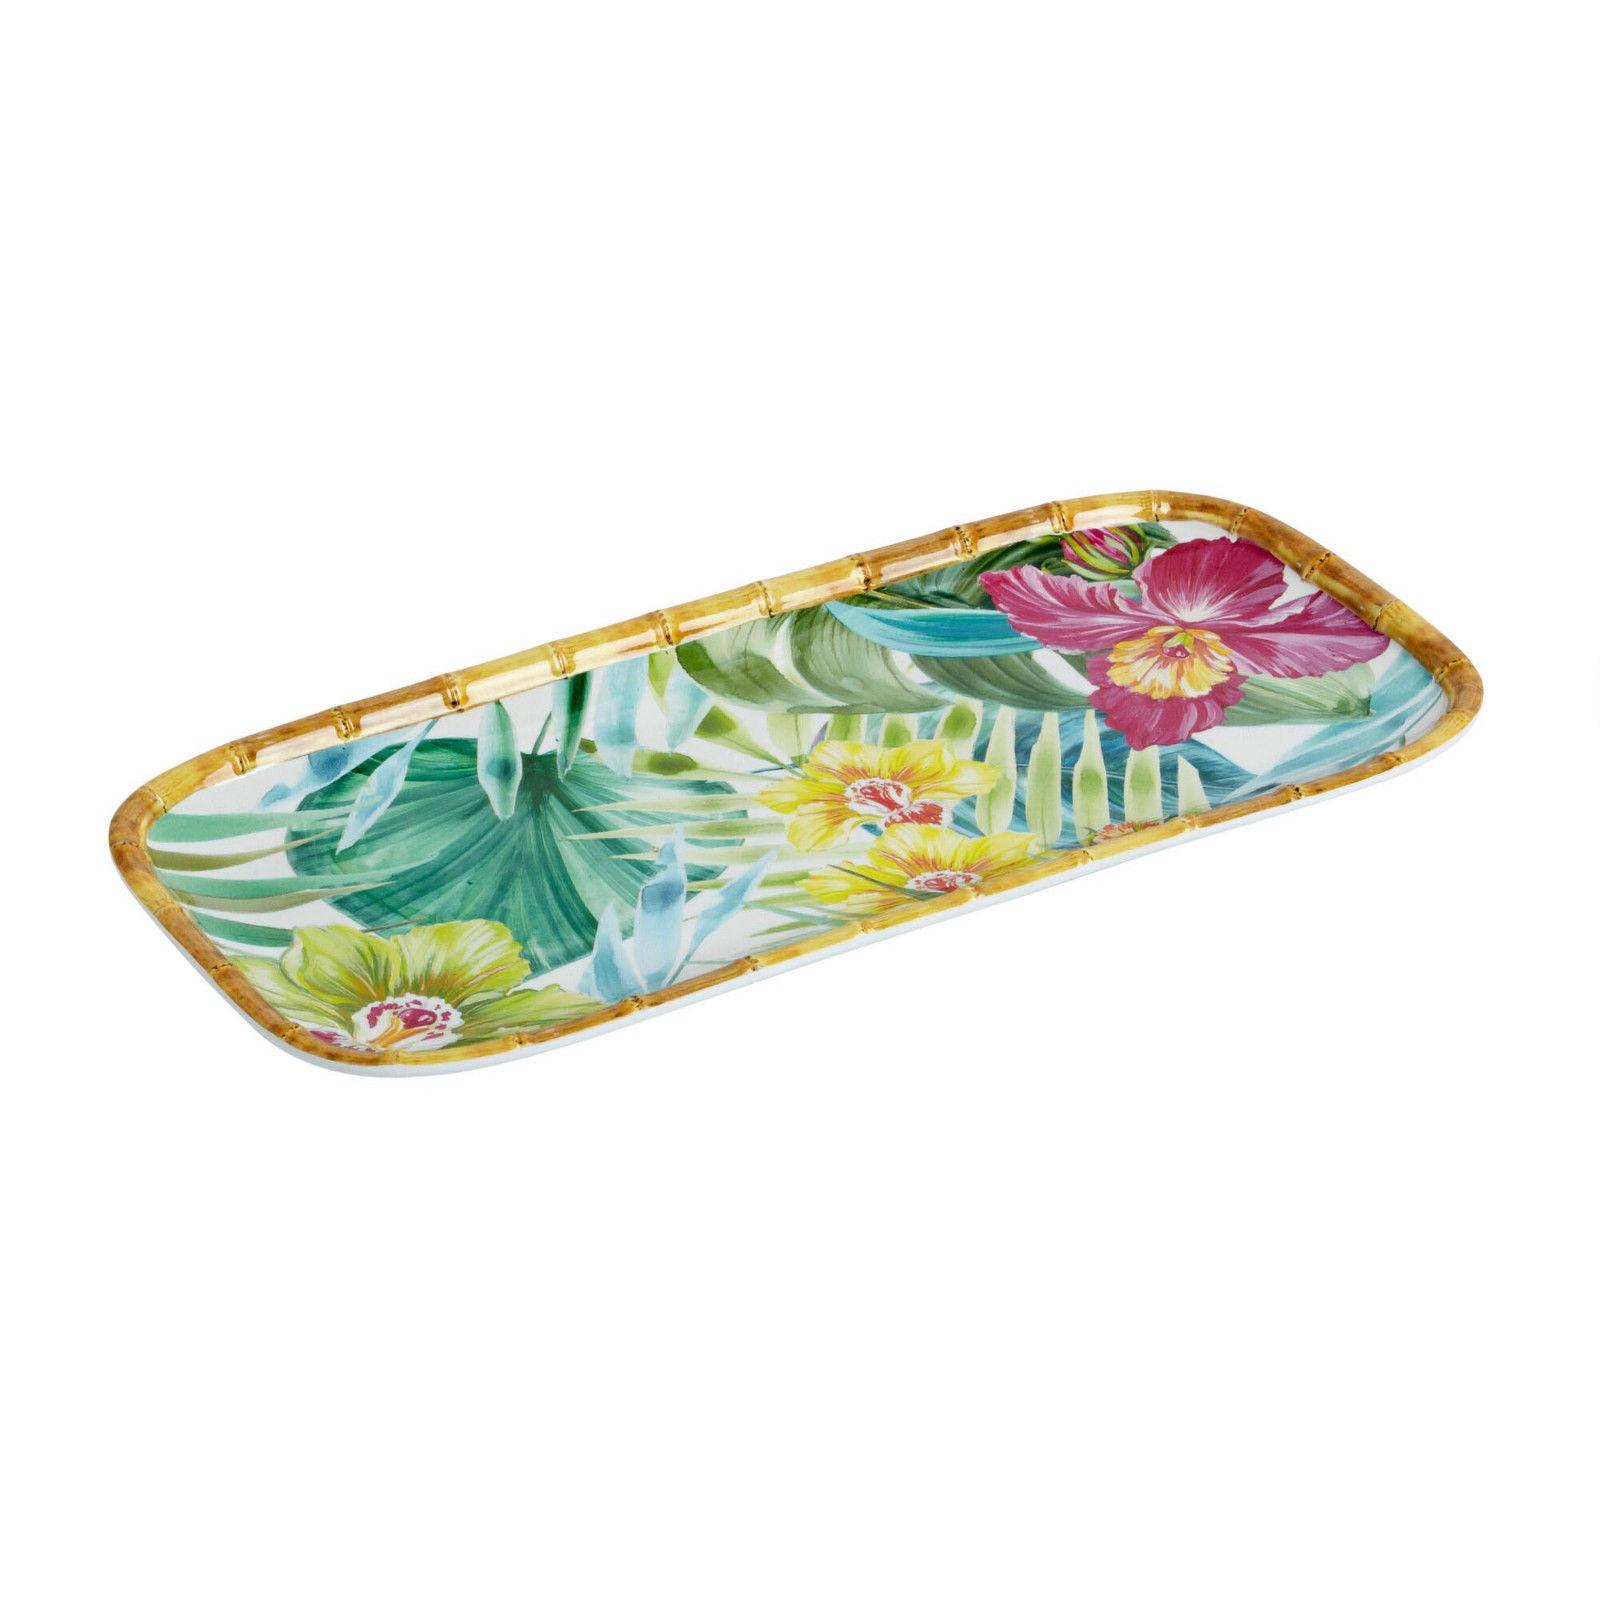 "Maui Melamine Serving Platter Tray 6.75""x14.75"" Coastal Living Beach House"